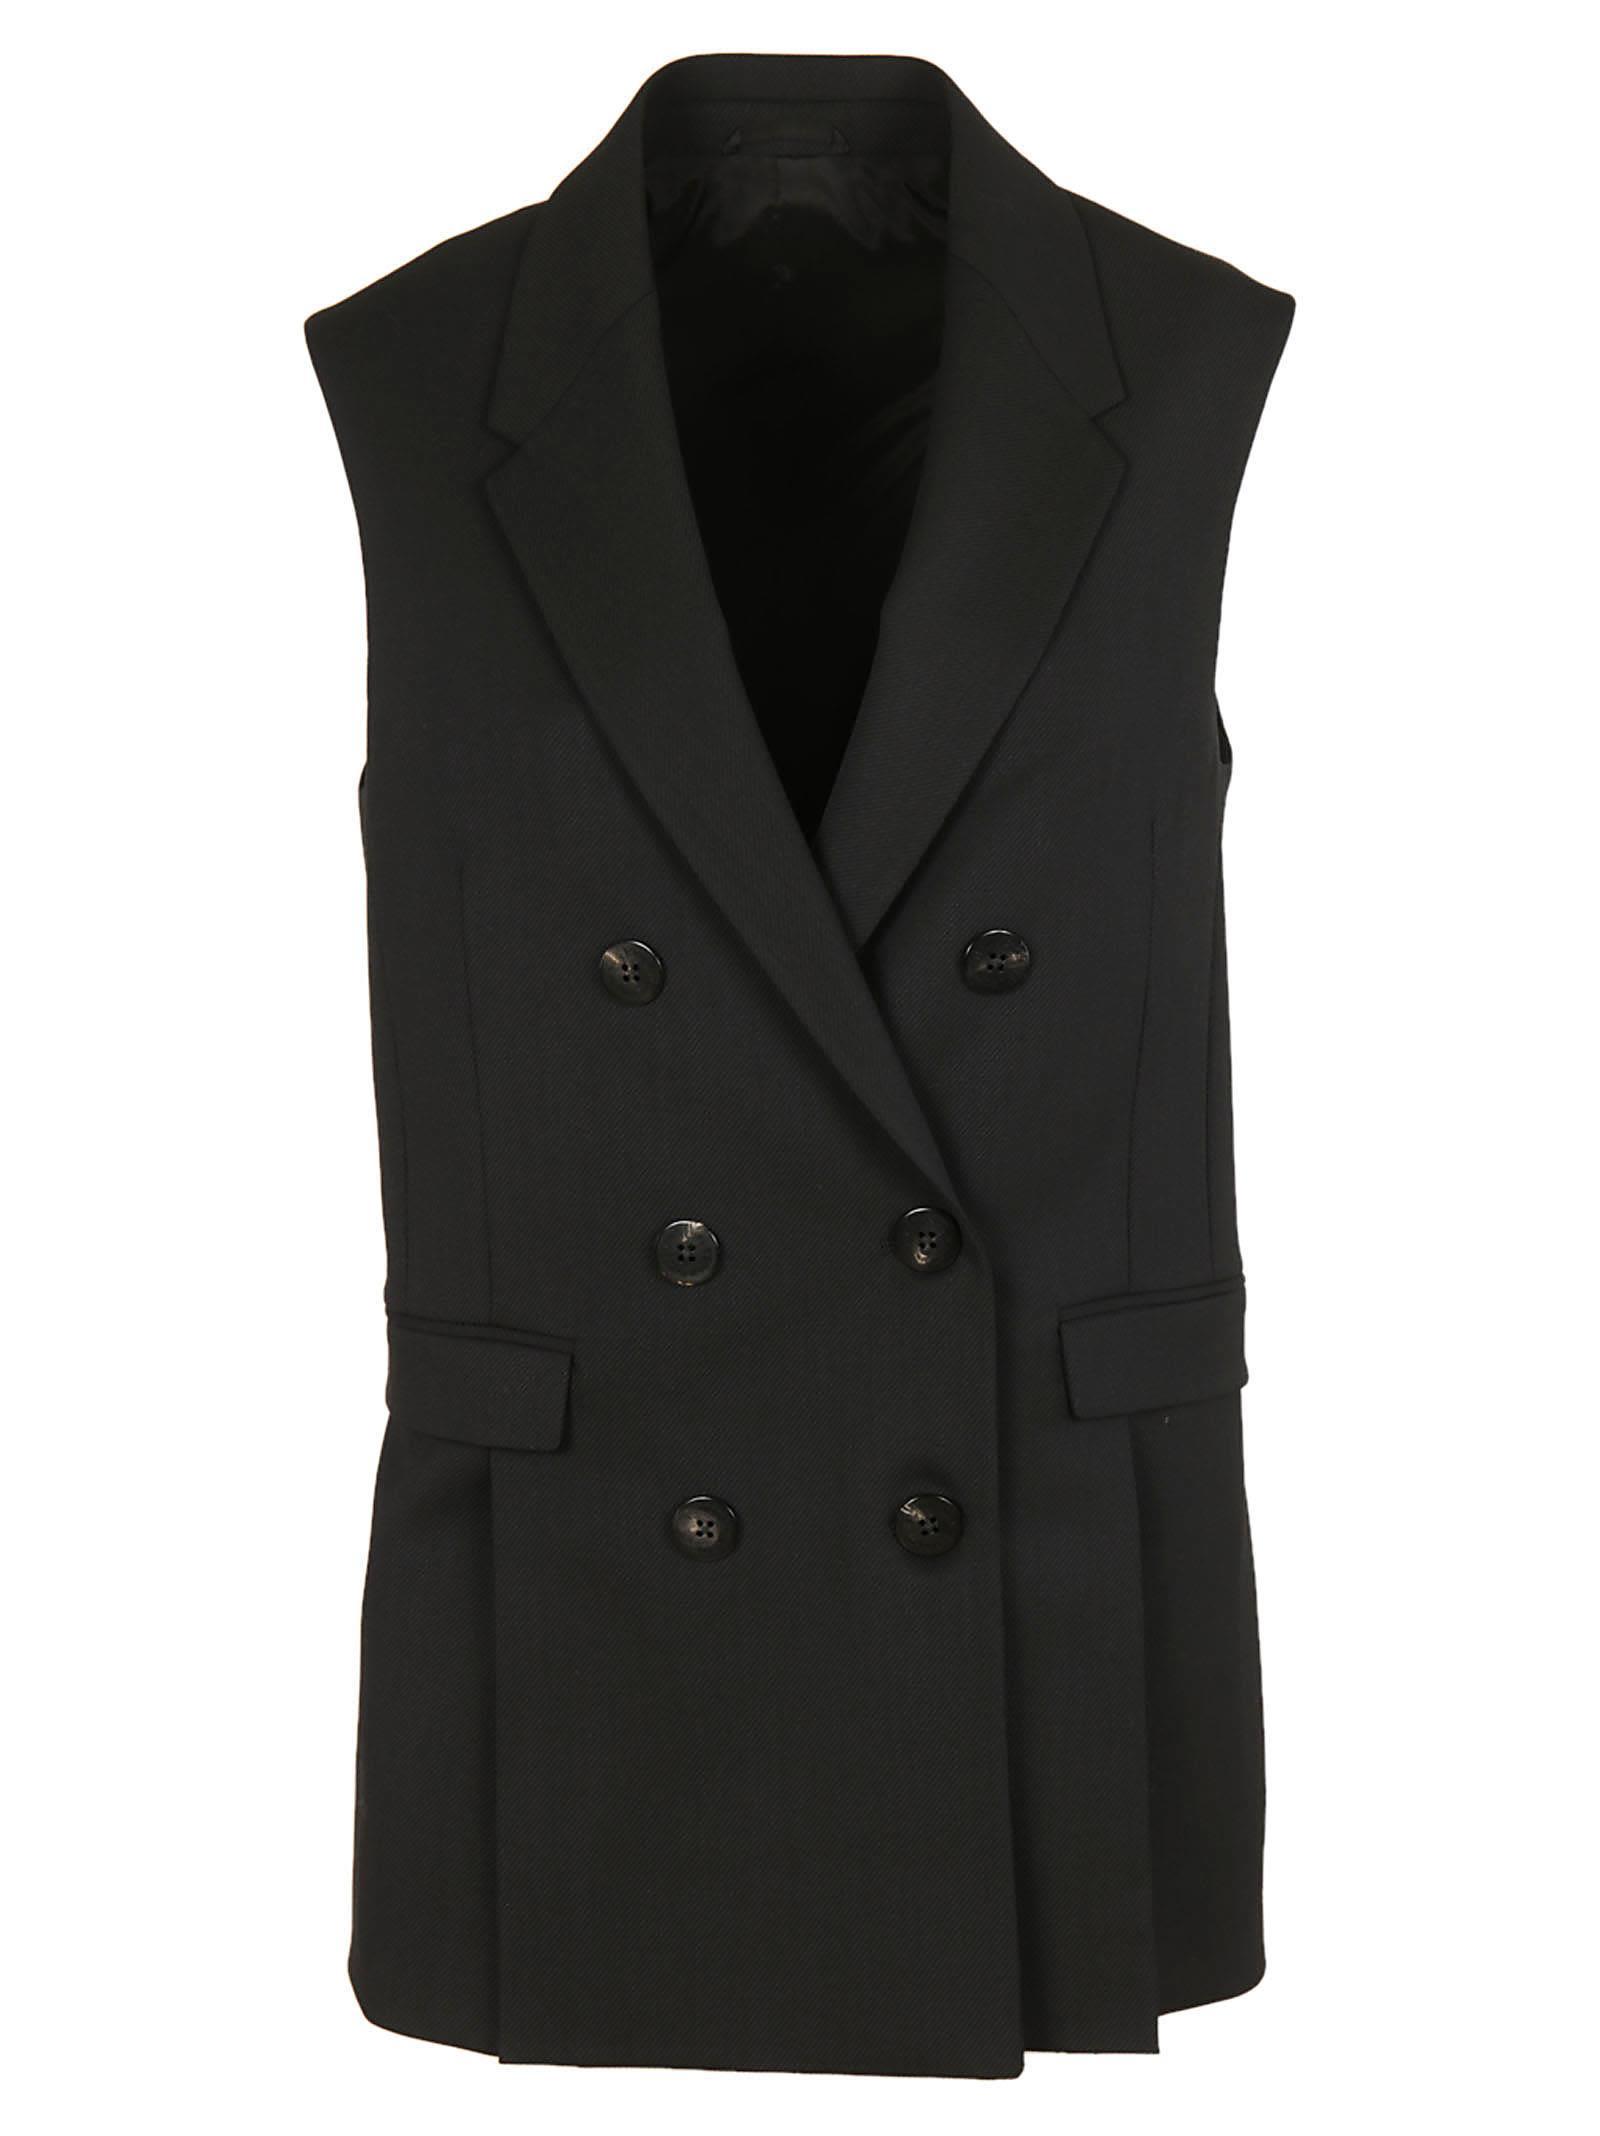 Neil Barrett Double Breasted Vest